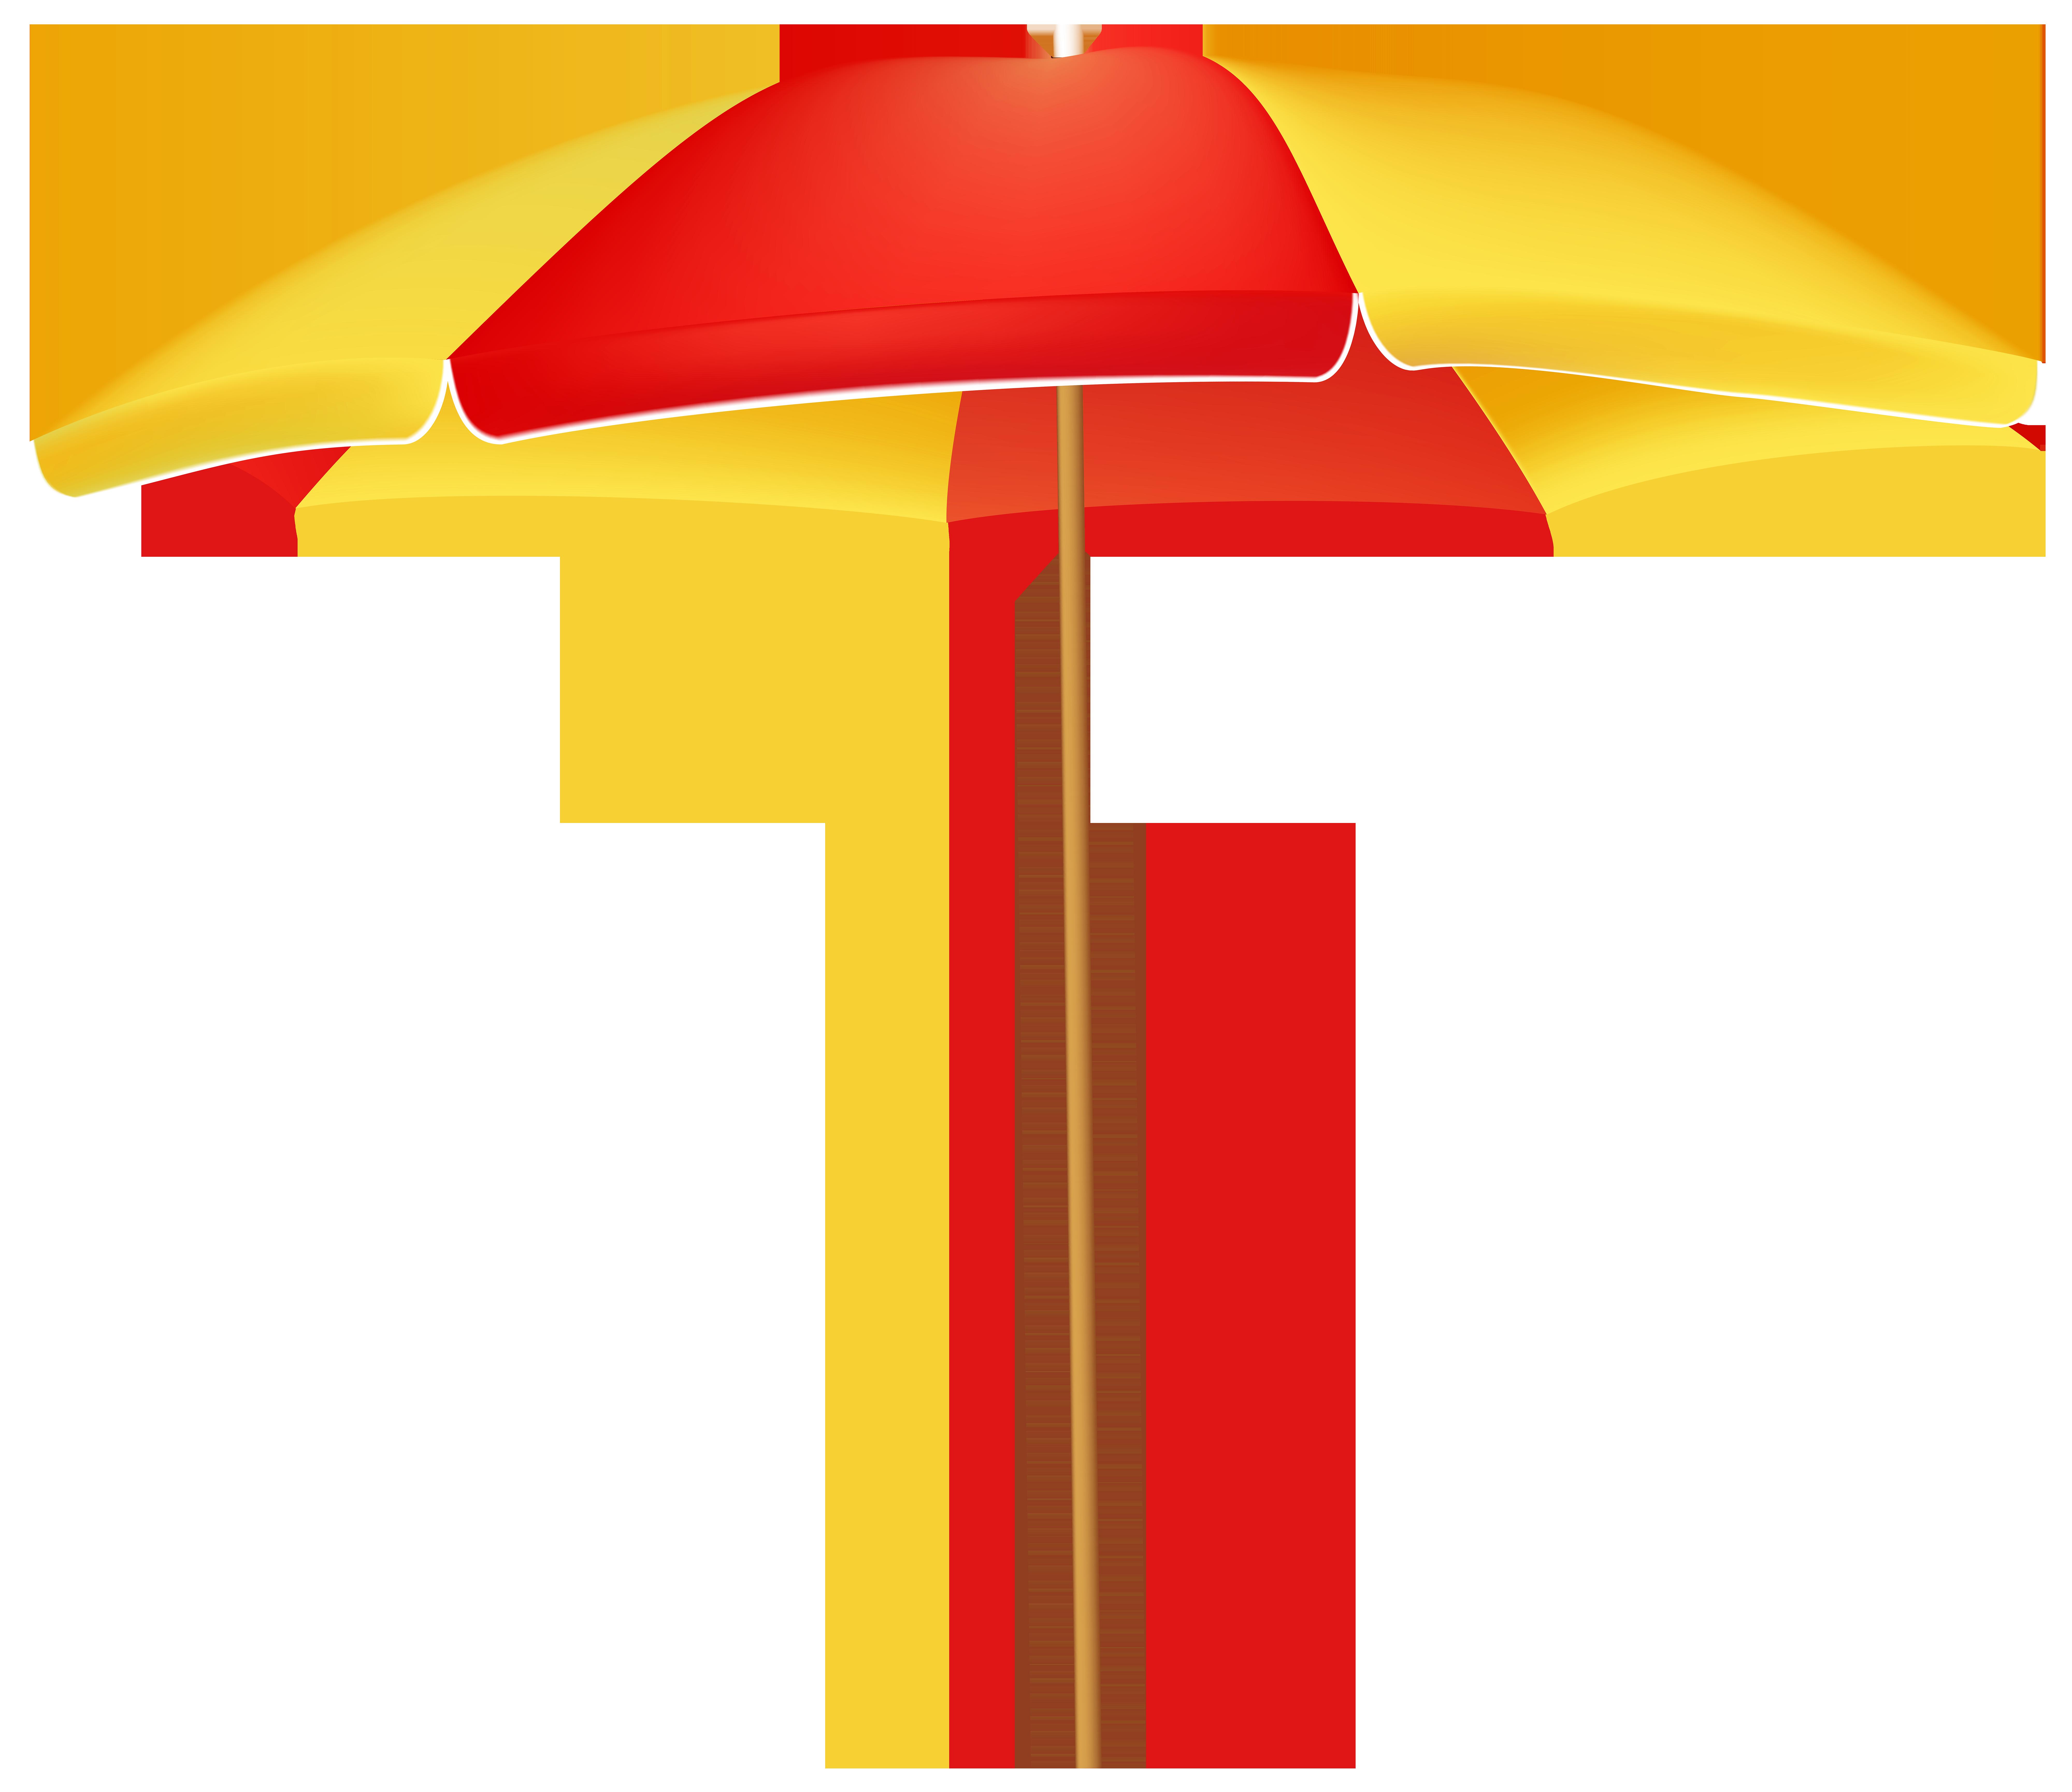 Sun umbrella clipart jpg black and white stock Beach Umbrella Silhouette at GetDrawings.com | Free for personal use ... jpg black and white stock